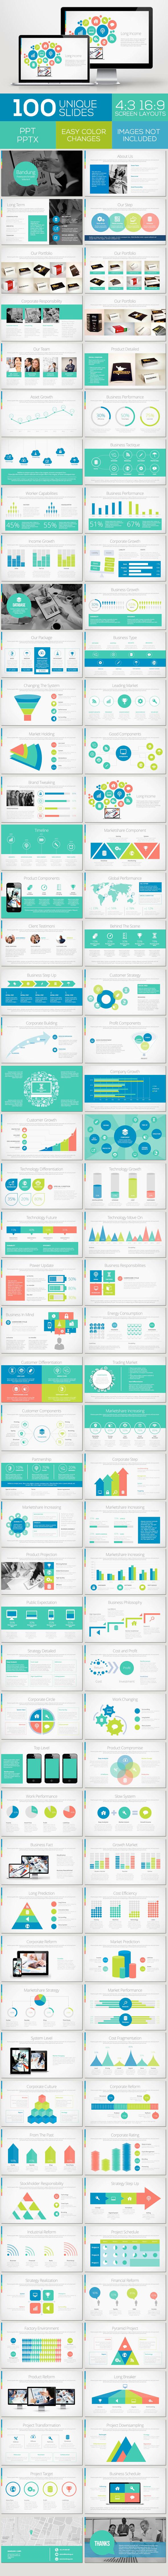 Bandung Powerpoint Template Volume 4 - Business PowerPoint Templates